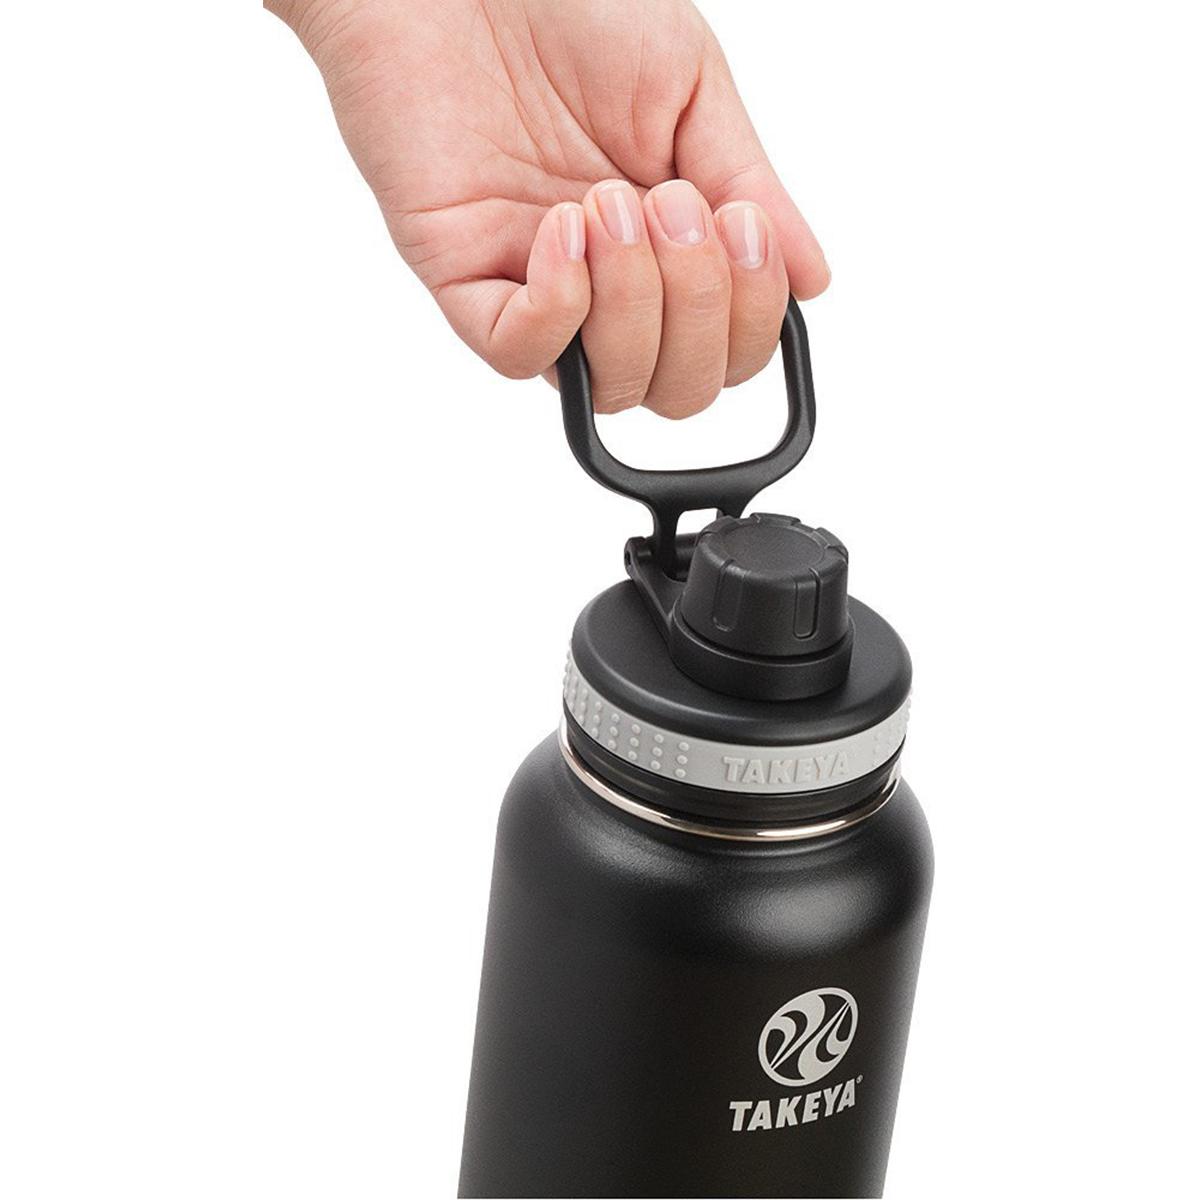 Takeya-Originals-32-oz-Insulated-Stainless-Steel-Water-Bottle thumbnail 5